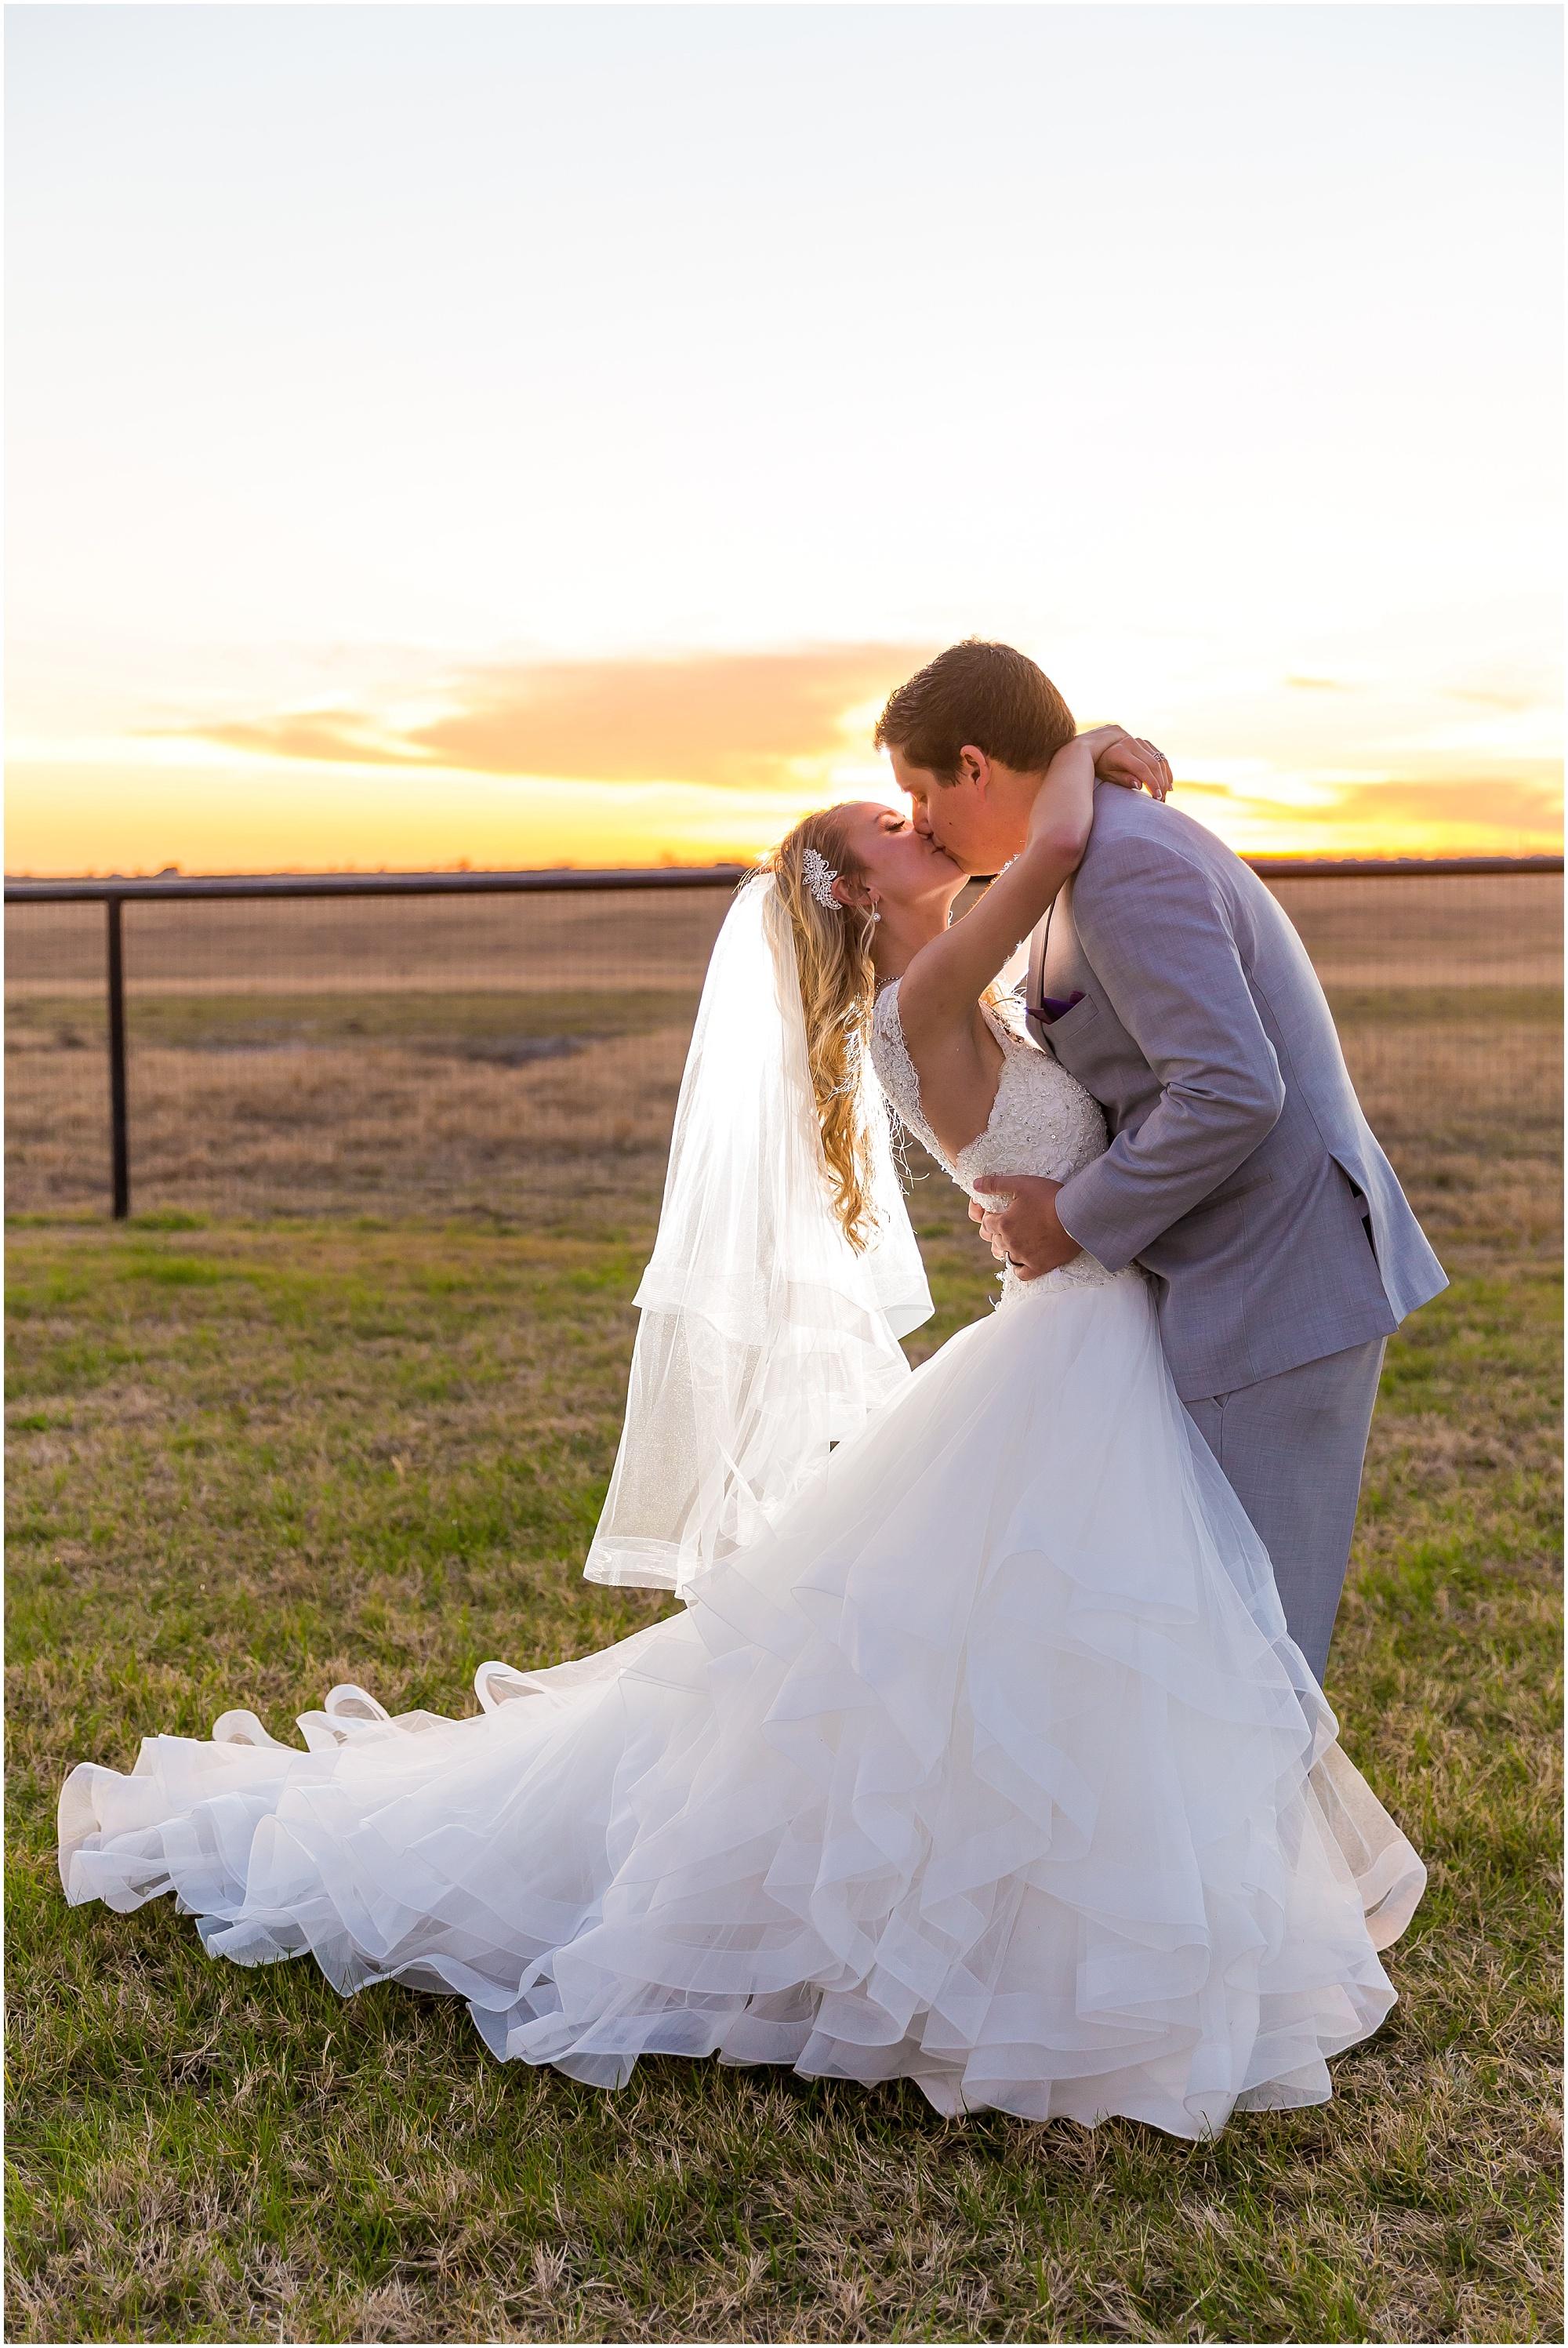 Disney-Inspired-Wedding-Central-Texas_0051.jpg